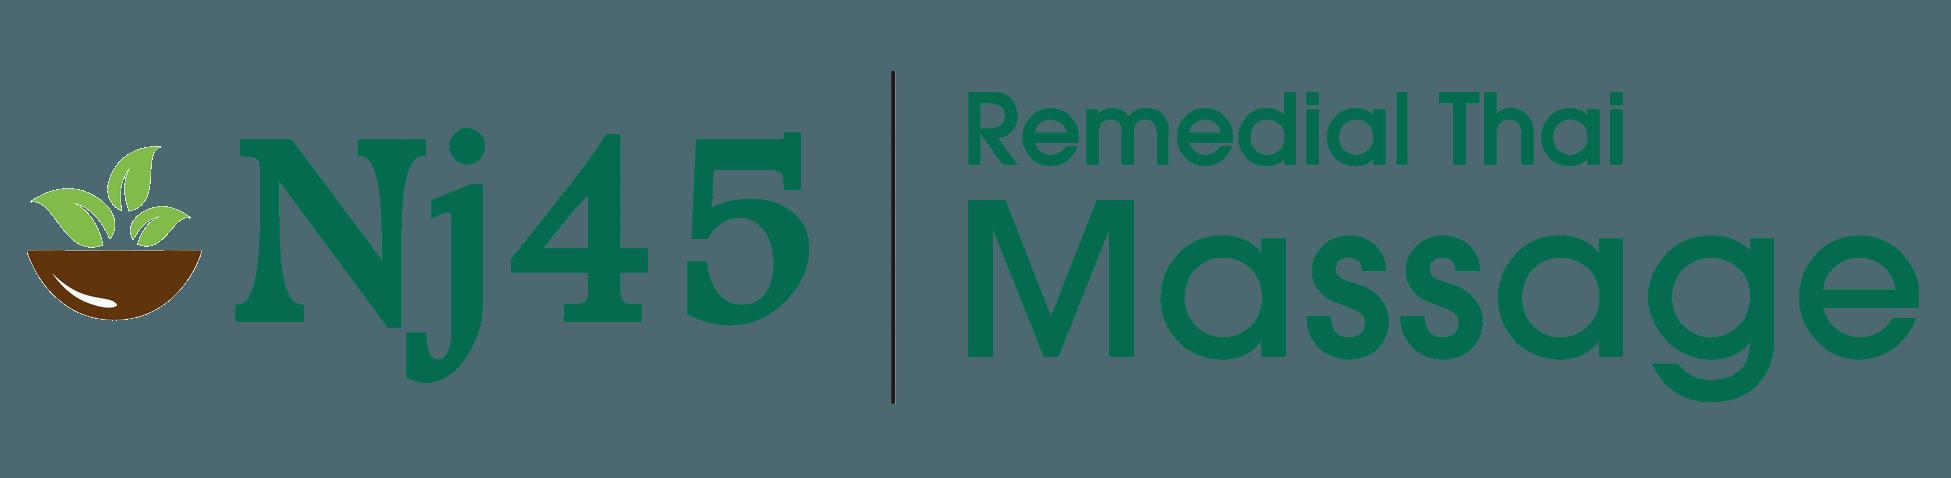 Nj45 Remedial Thai Massage Rouse Hill